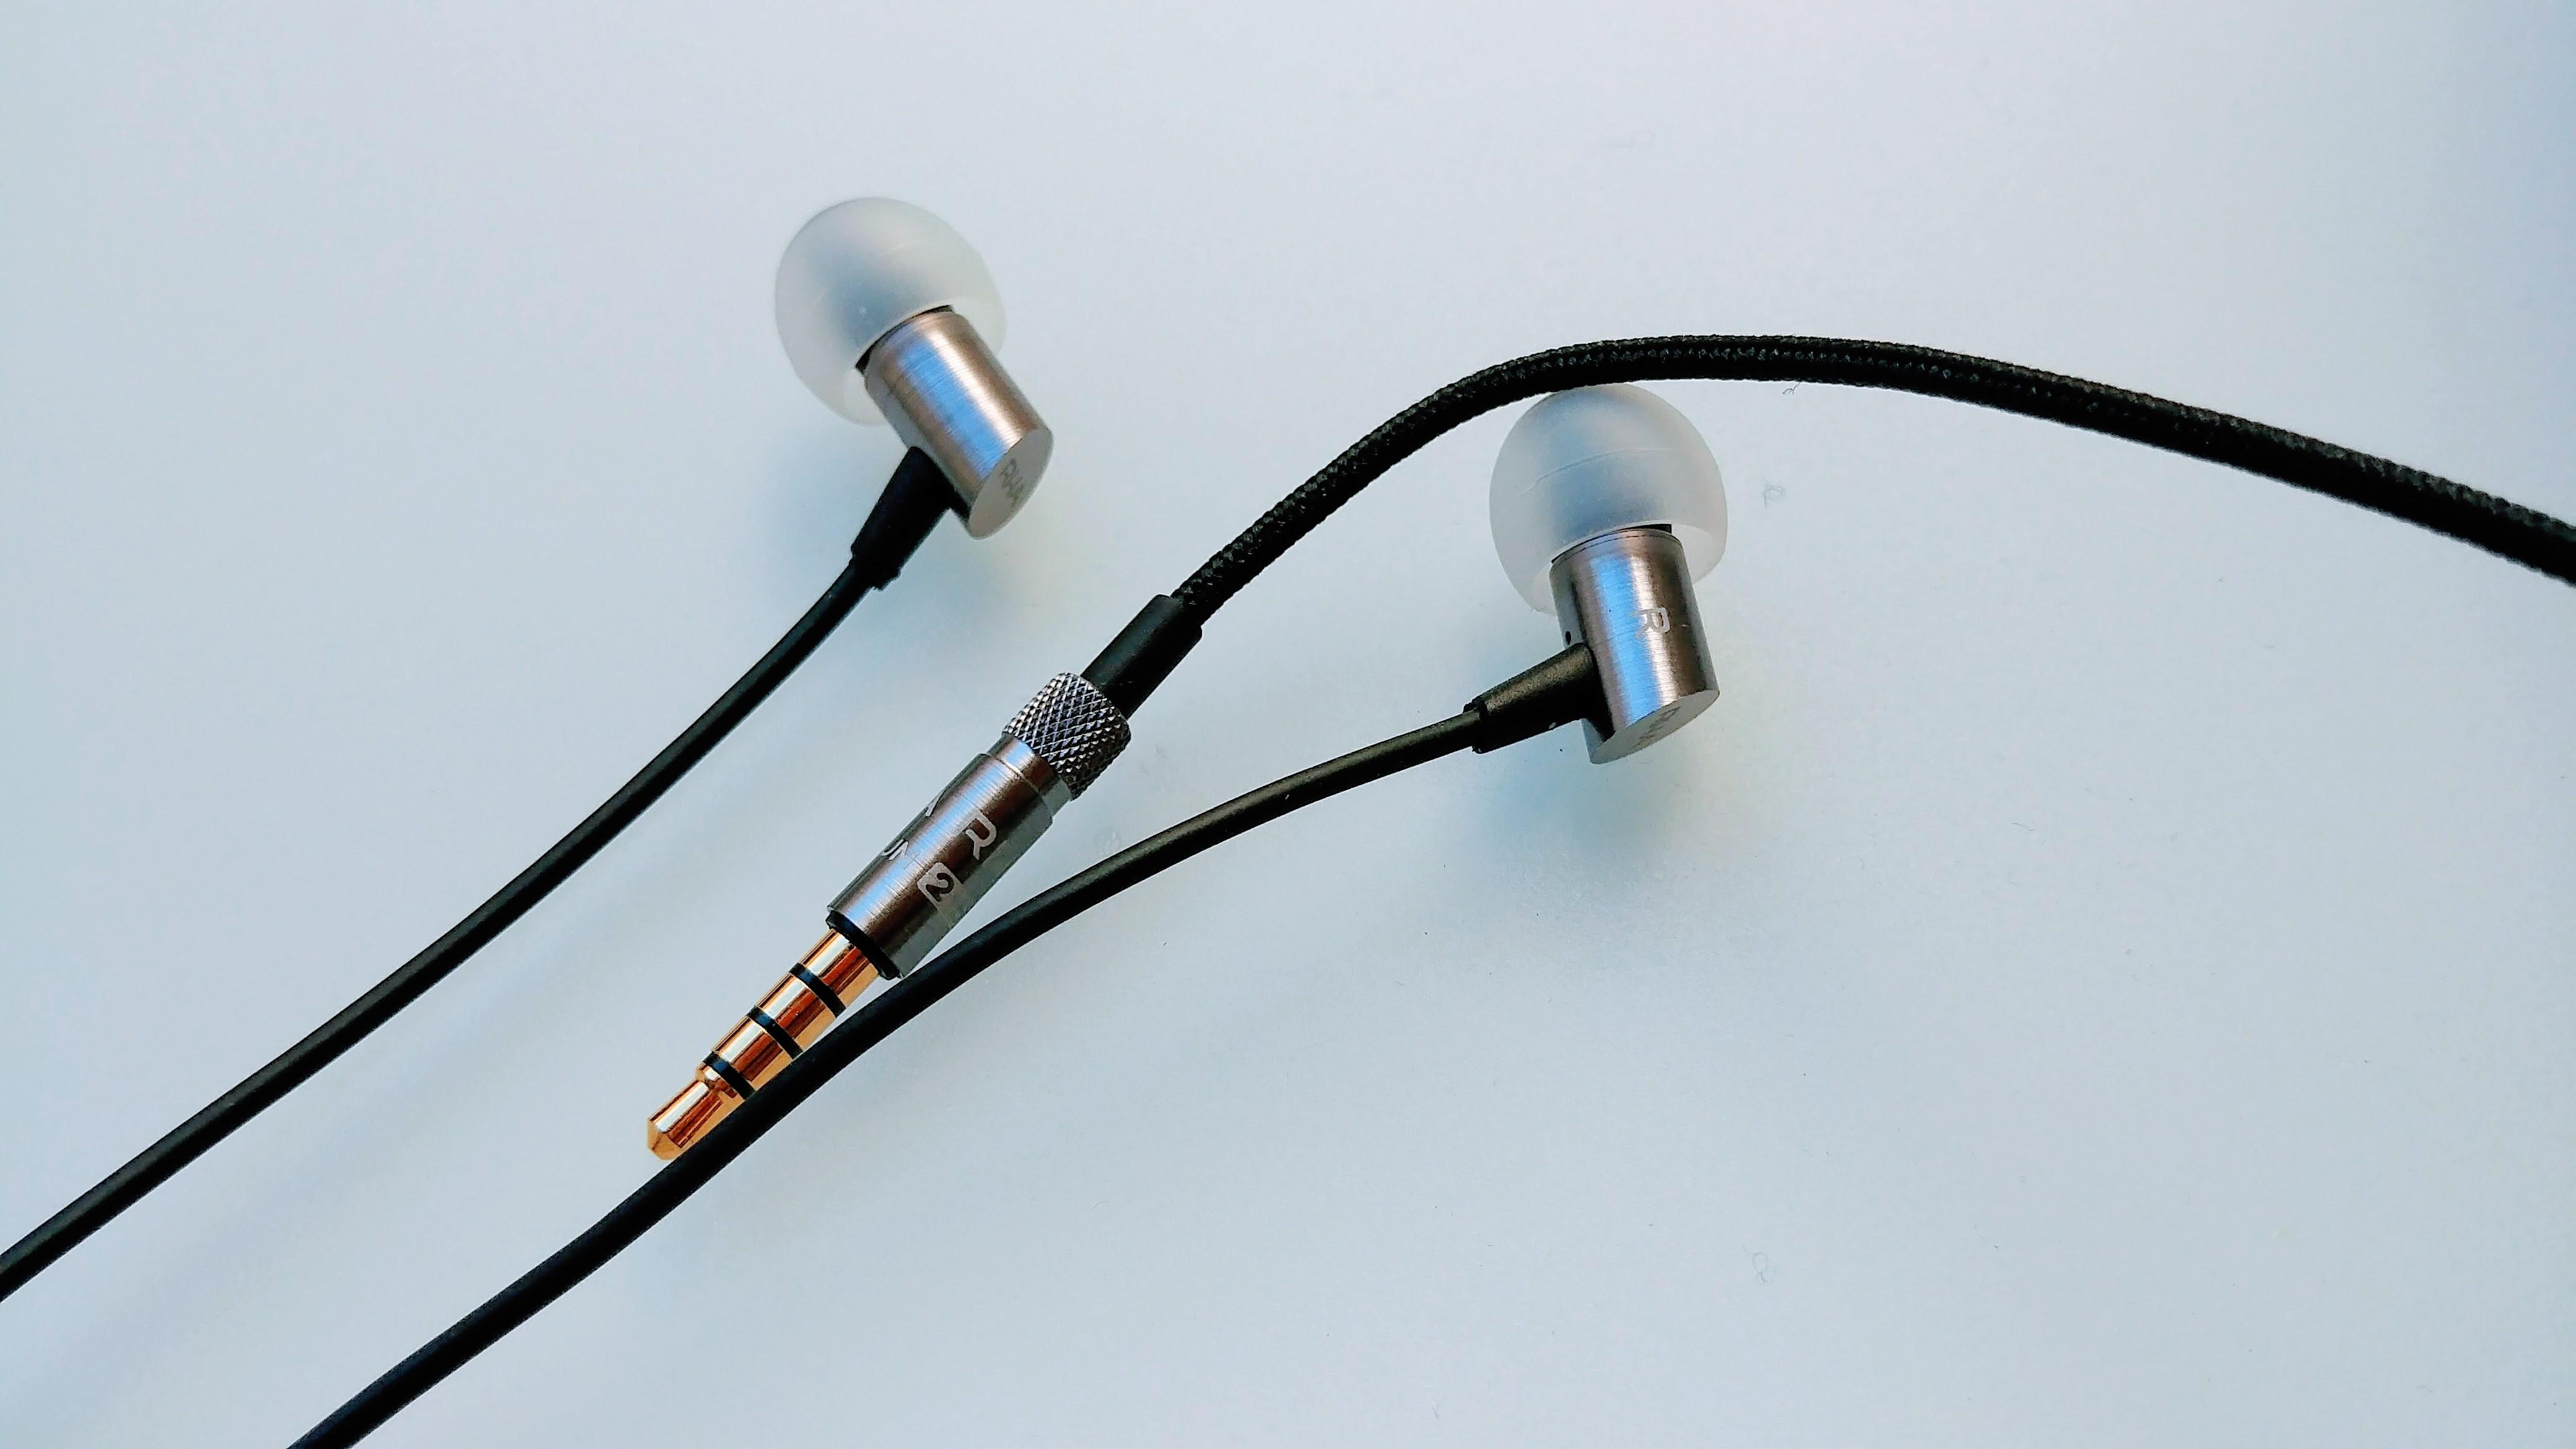 RHA S500u / RHA S500i headphones